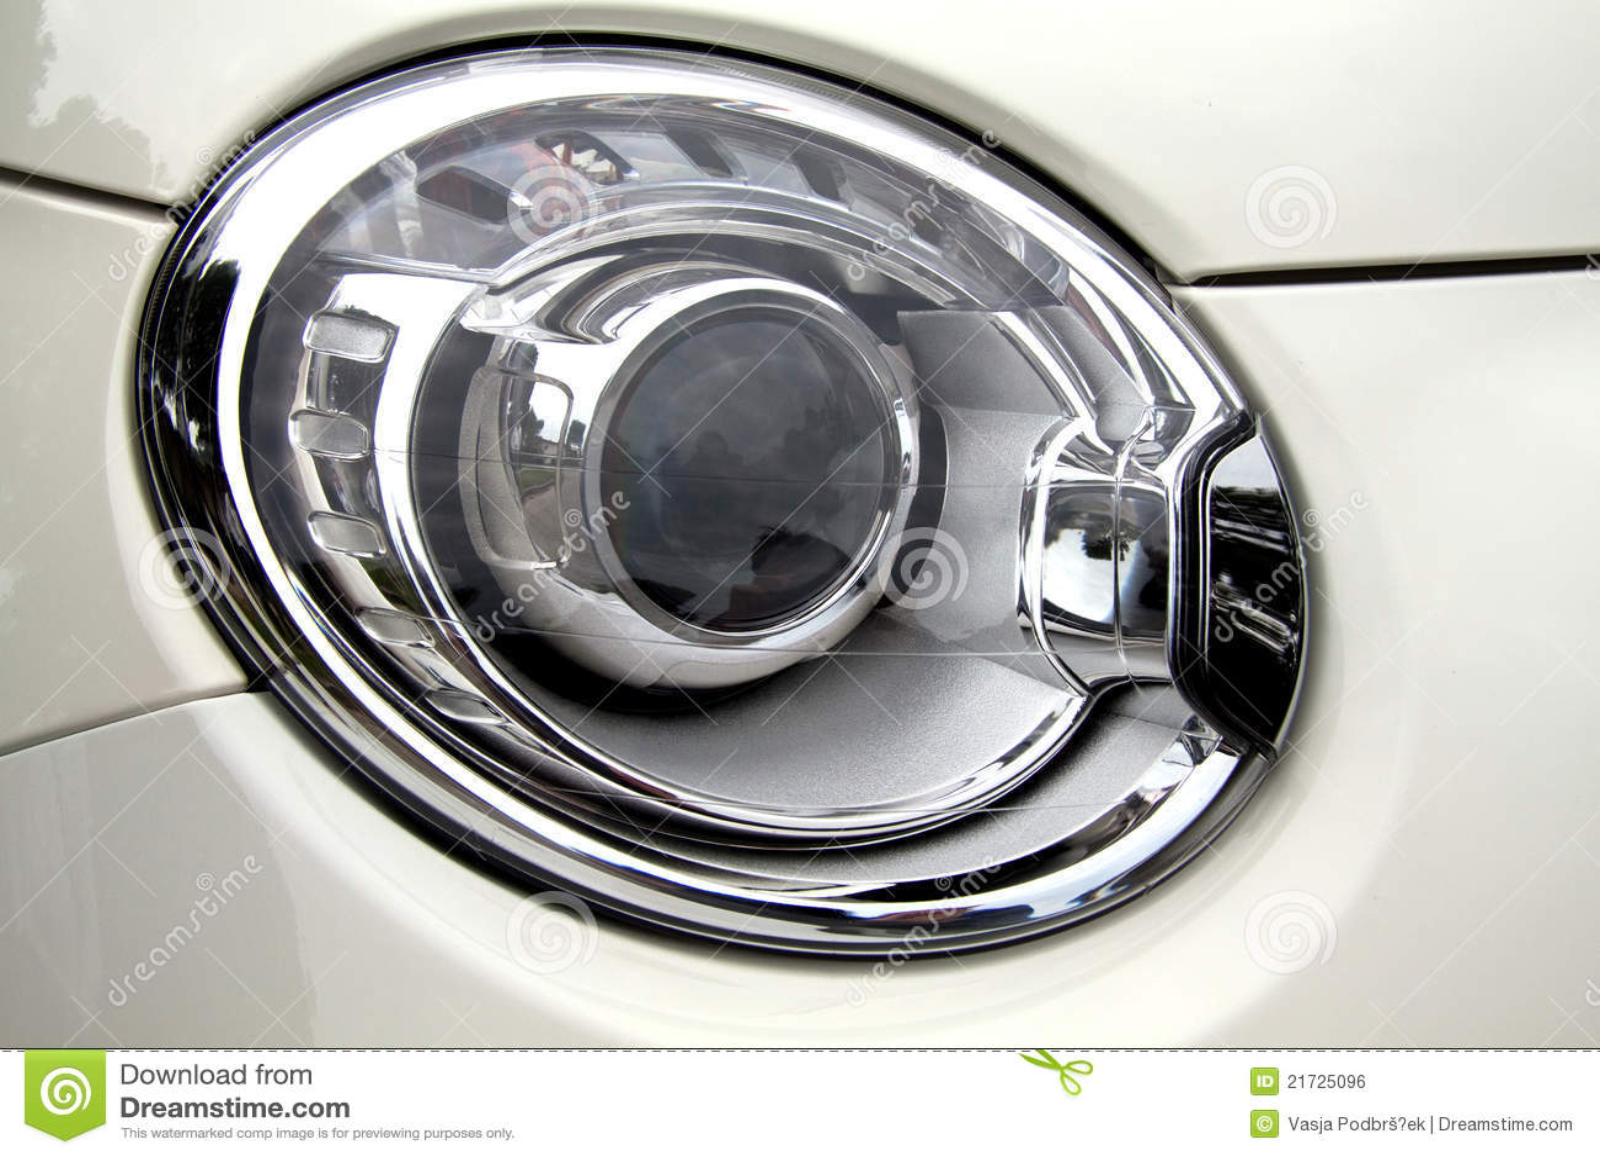 500 Abarth headlight stock photo. Image of fast, cost - 21725096